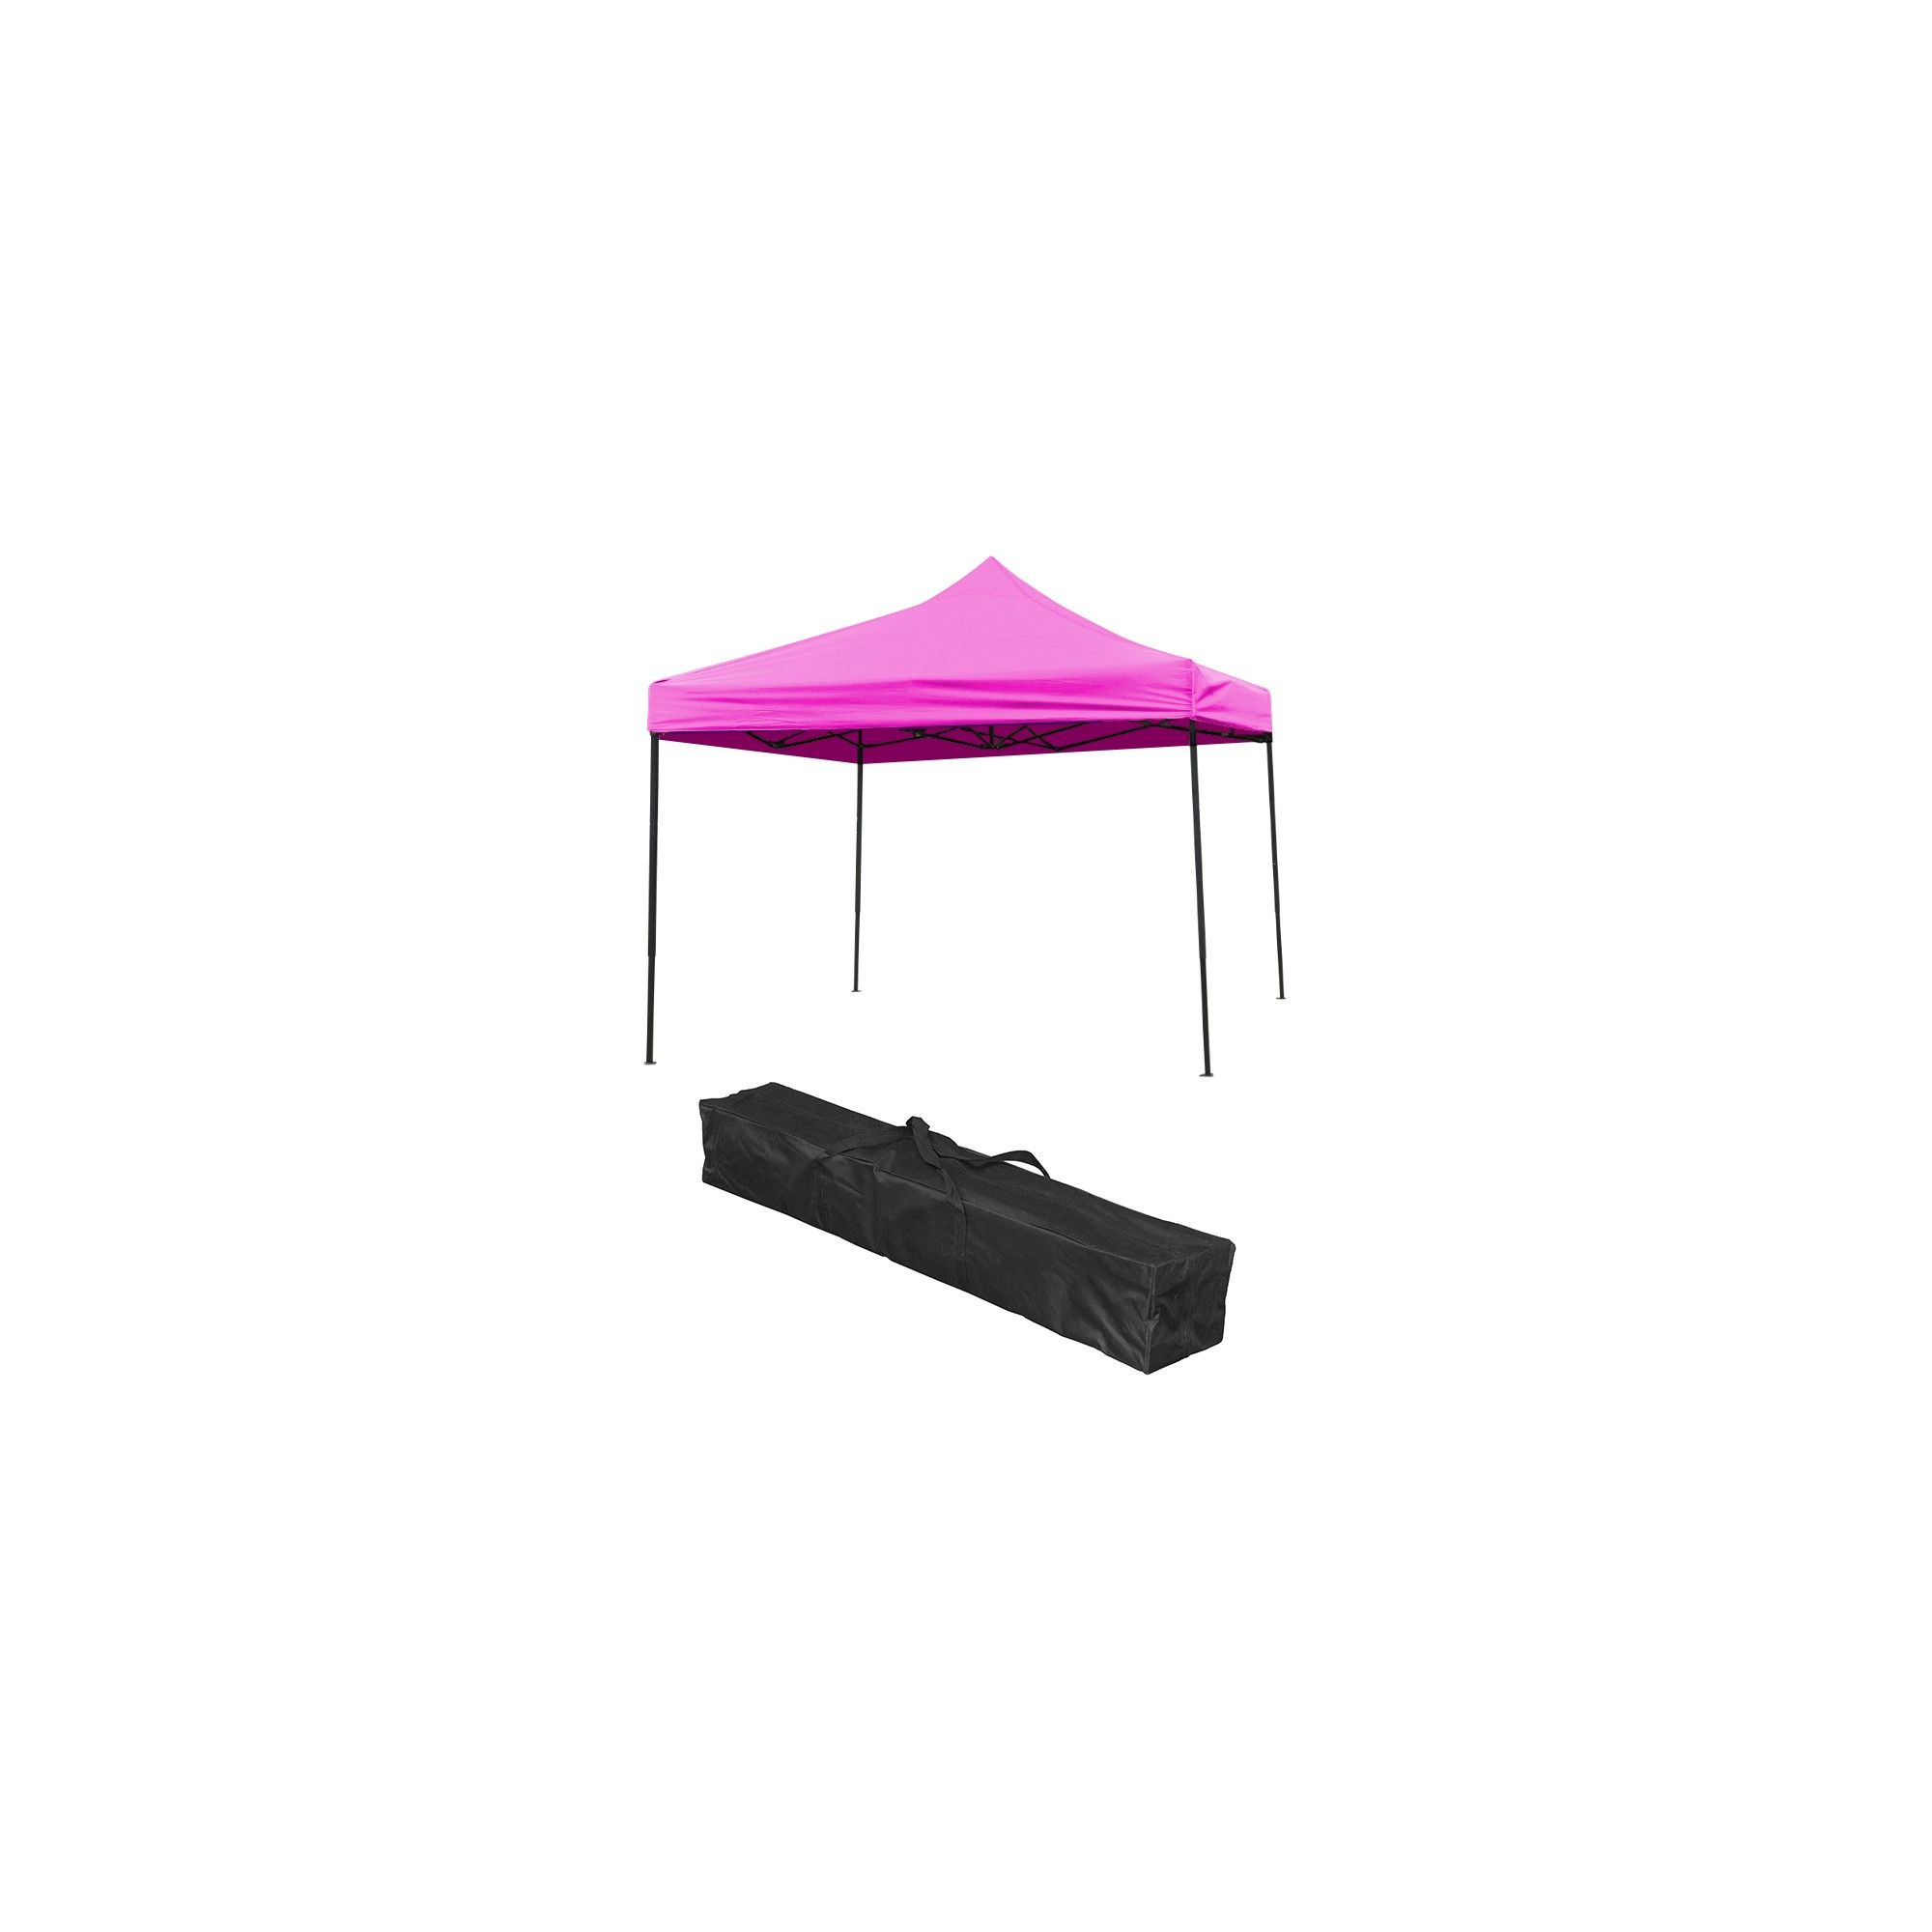 Trademark Innovation Lightweight and Portable Canopy Tent Set 10u0027 X 10u0027 - Pink  sc 1 st  Pinterest & Trademark Innovation Lightweight and Portable Canopy Tent Set 10 ...